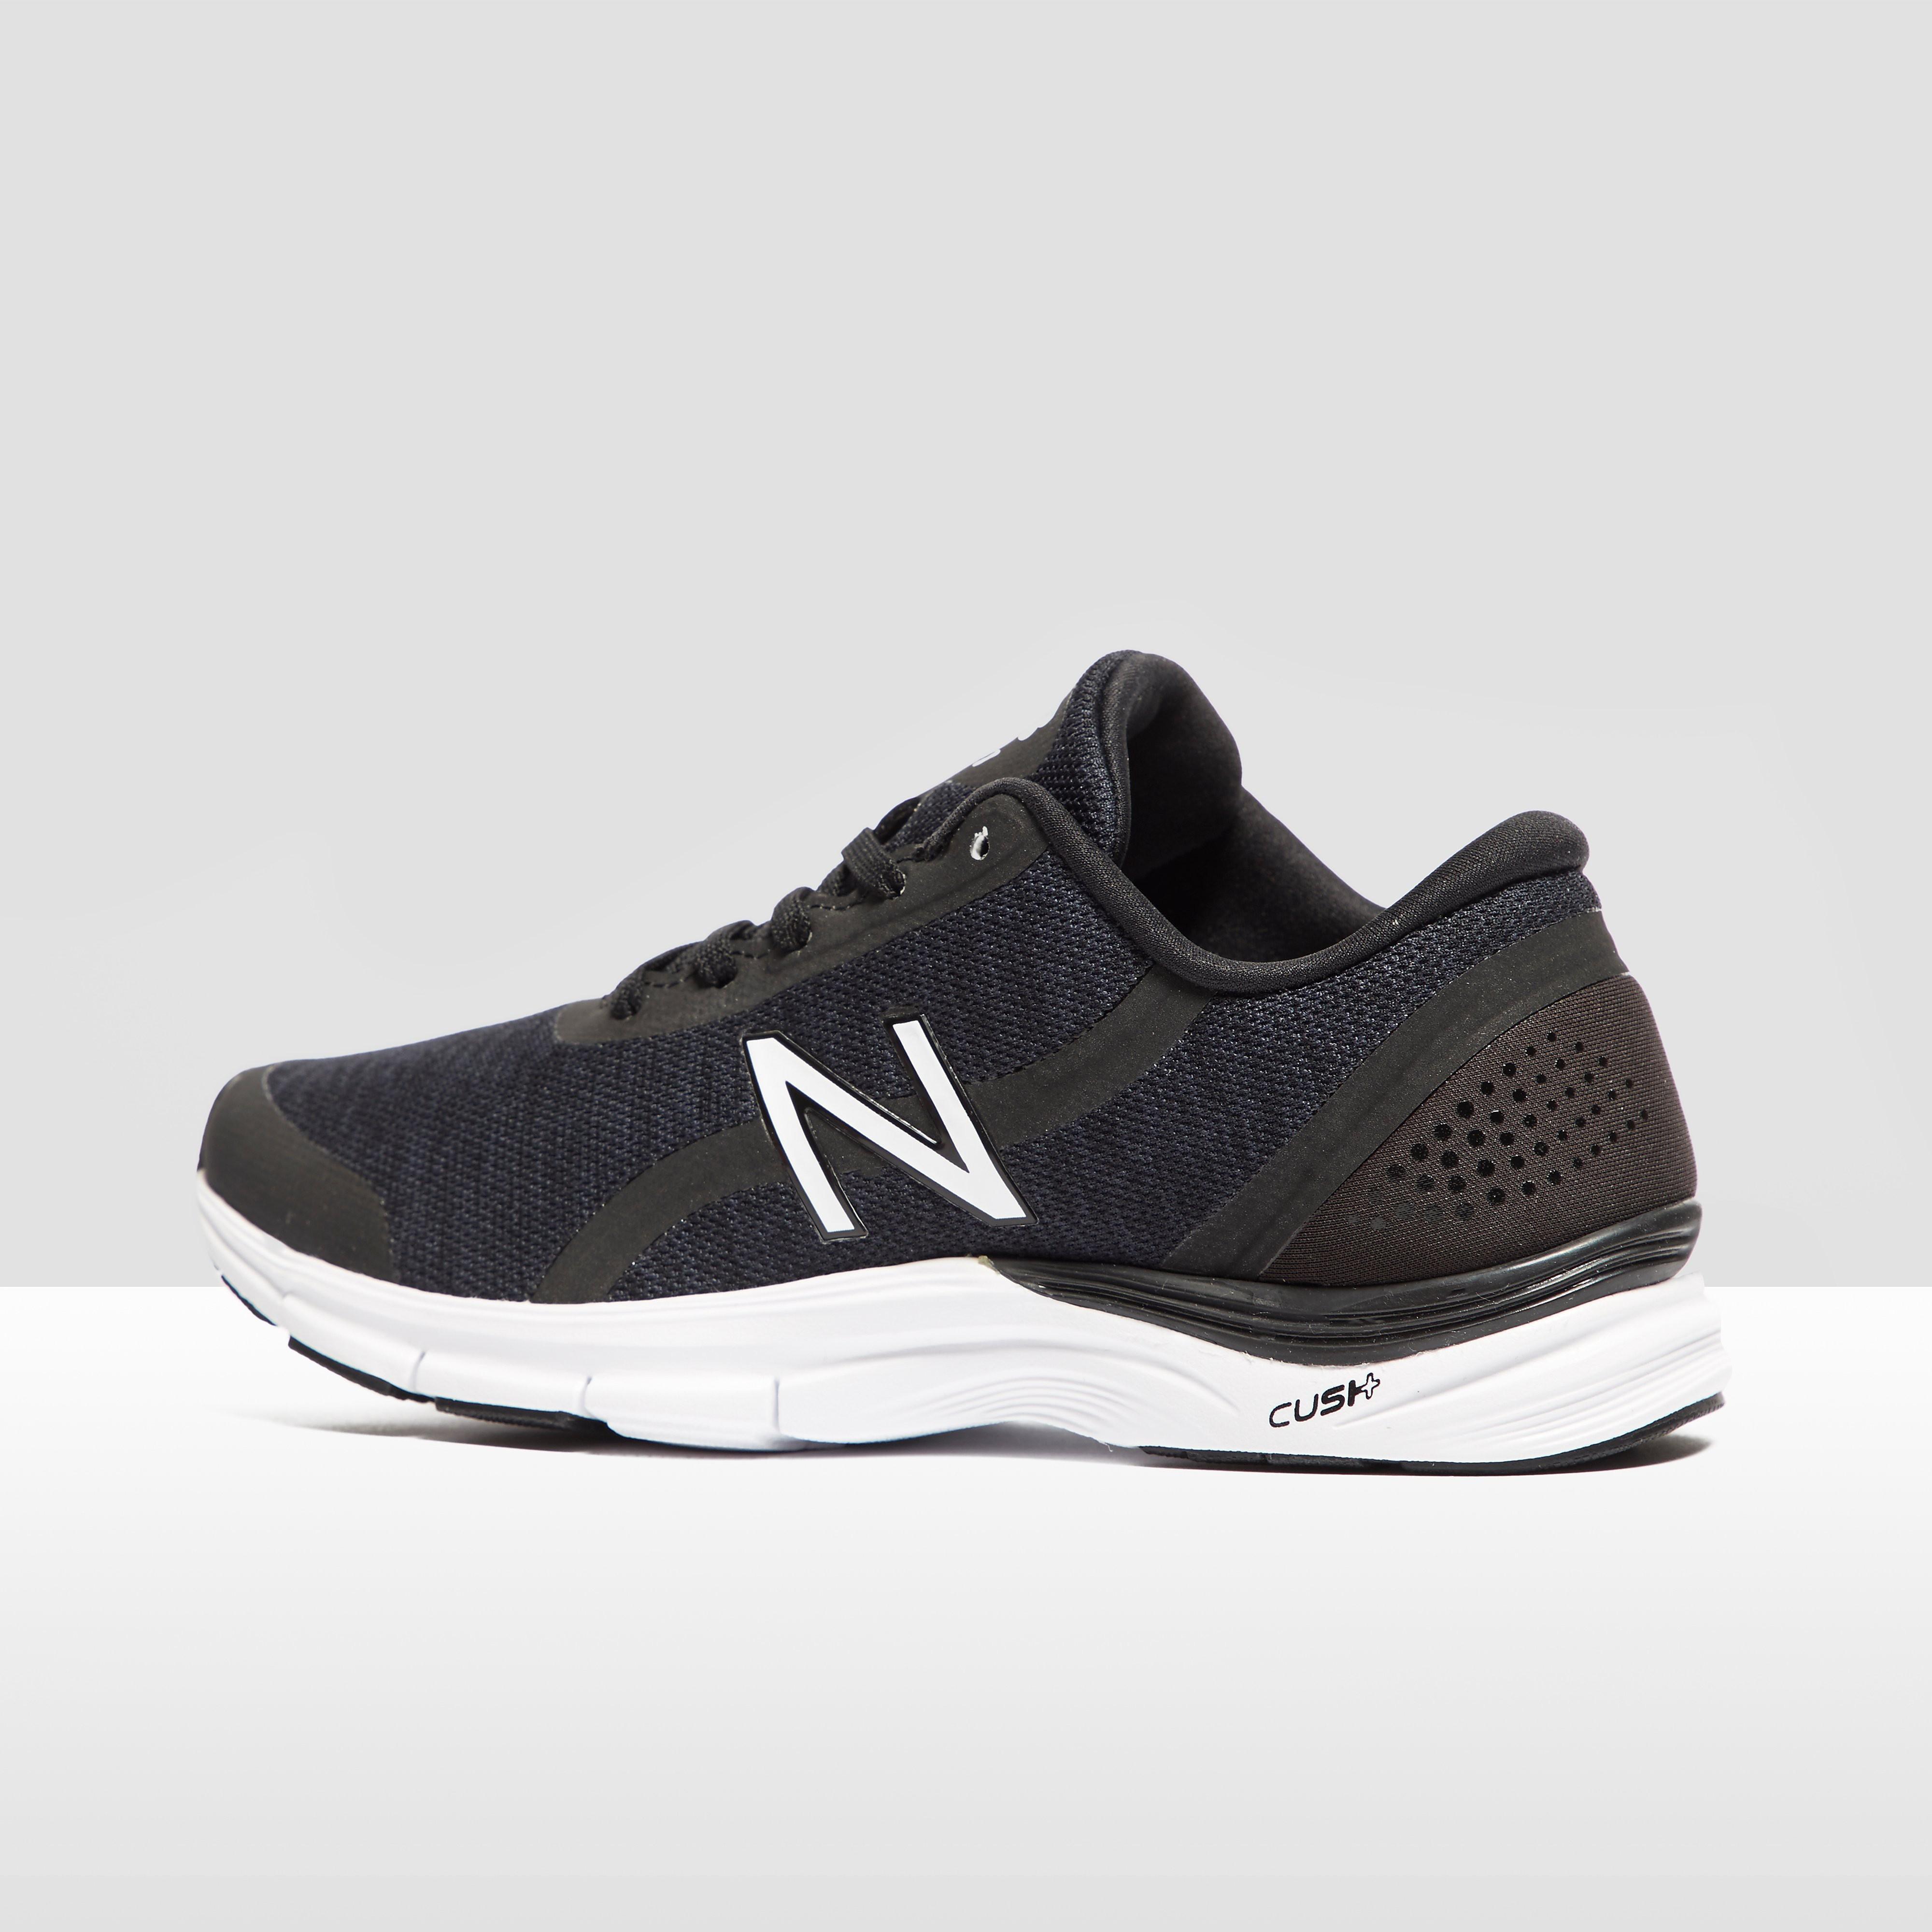 New Balance W711 V3 Women's Training Shoes